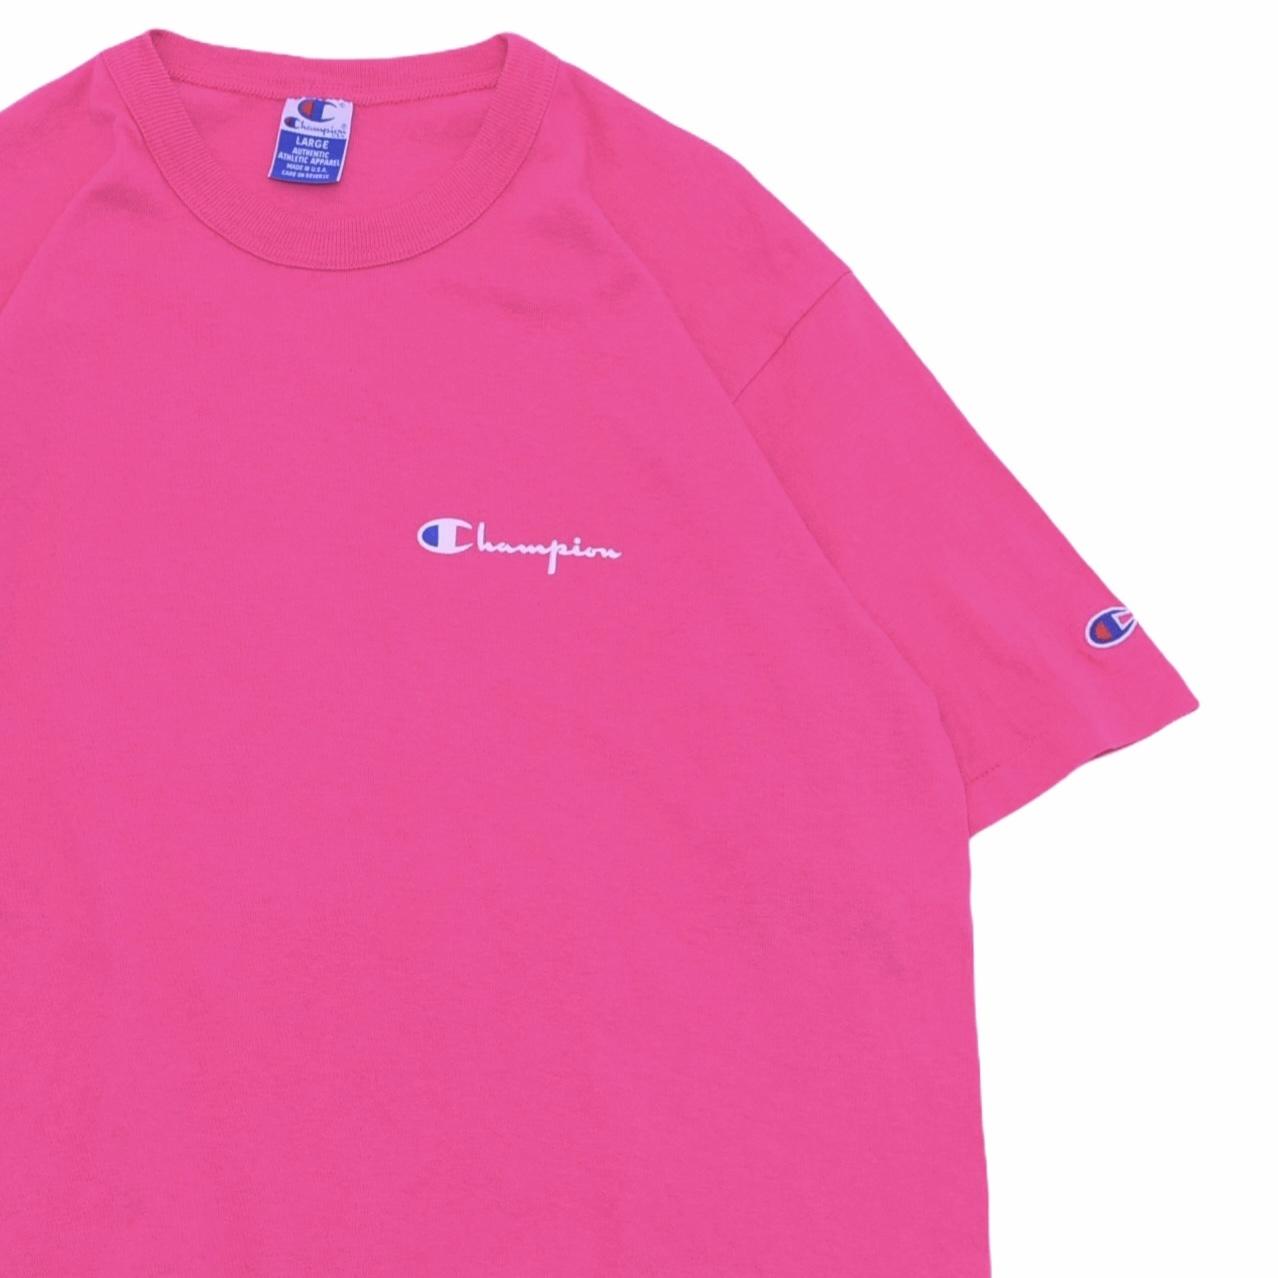 90's Champion logo T-shirt Made in USA